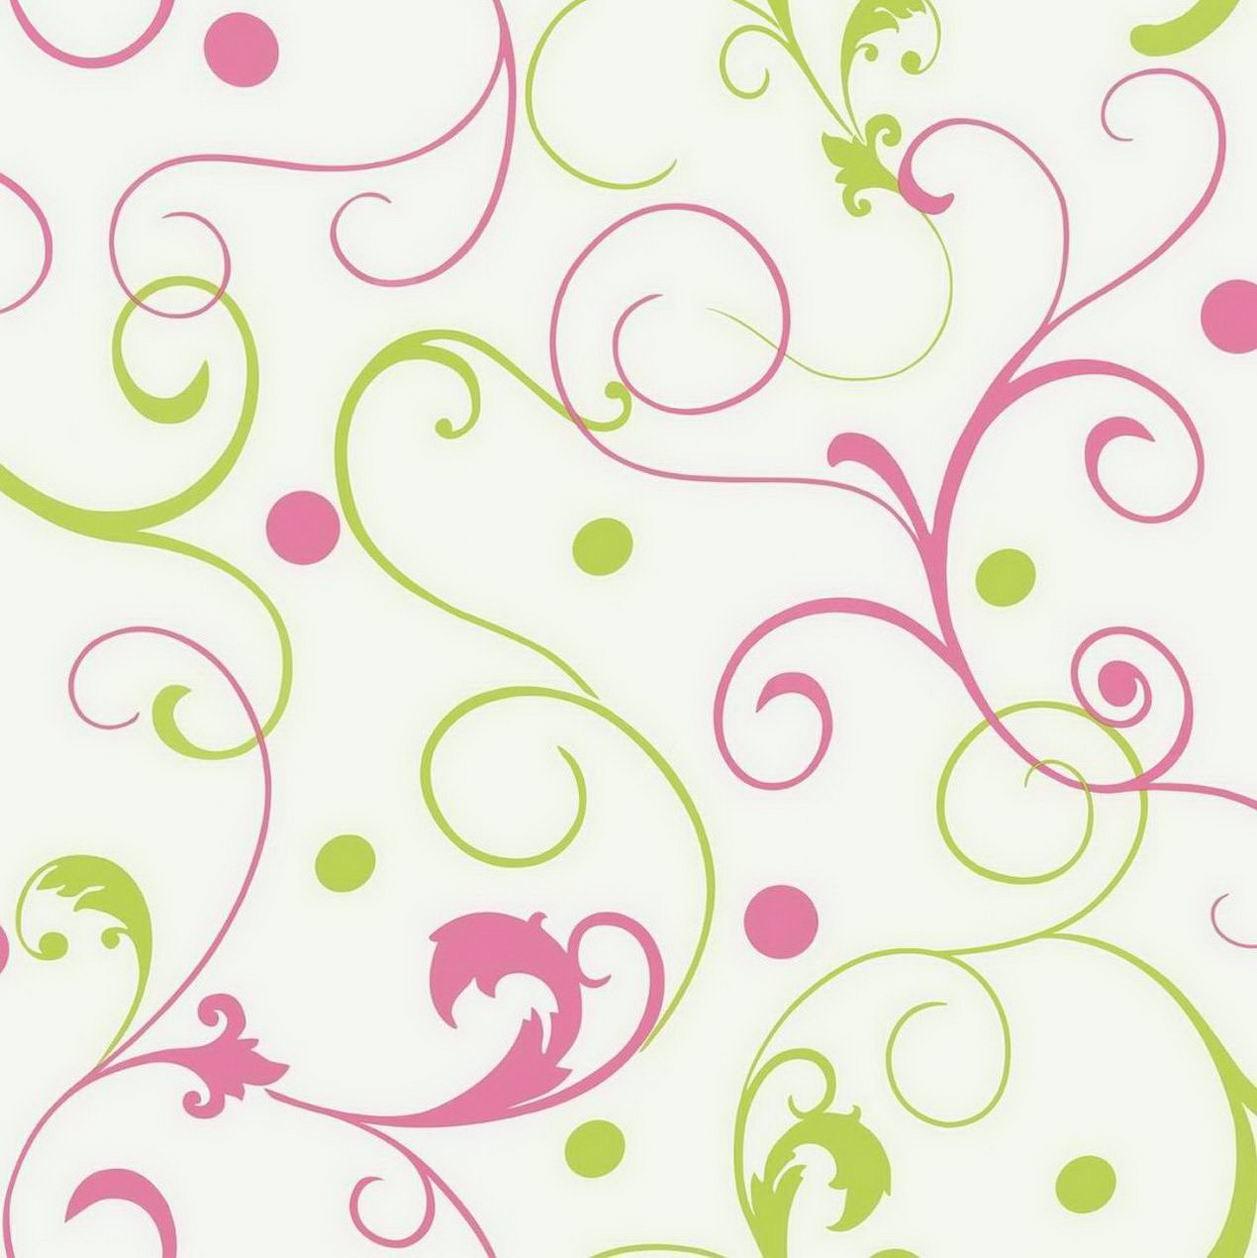 Designs Patterns Simple